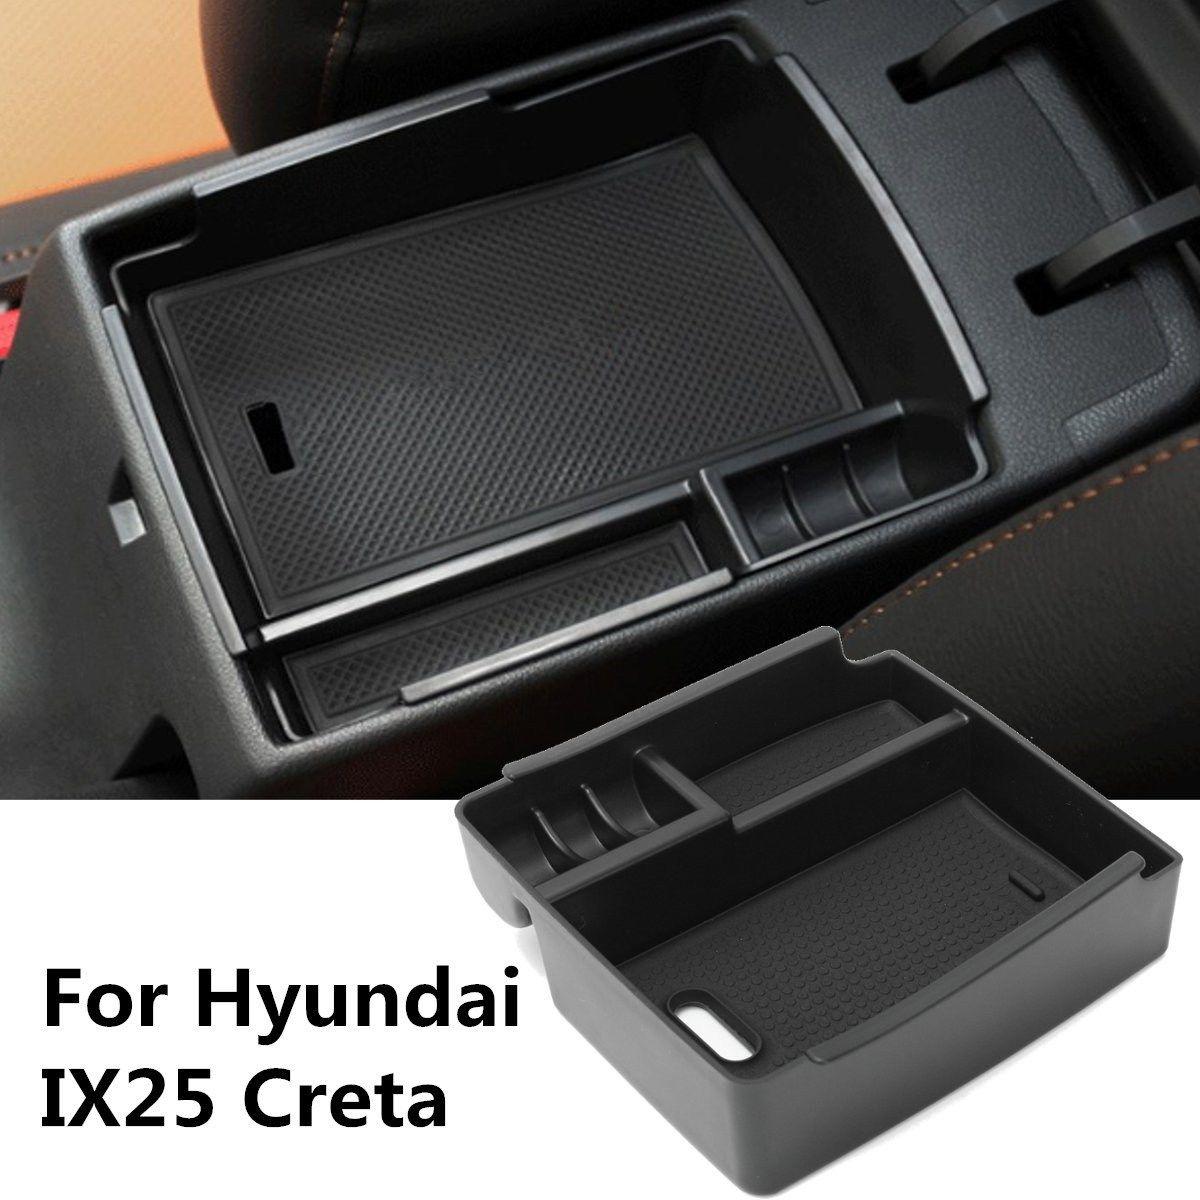 Black Car Central Console Armrest Storage Box Cup Phone Tray For Hyundai IX25 Creta 2015 2016